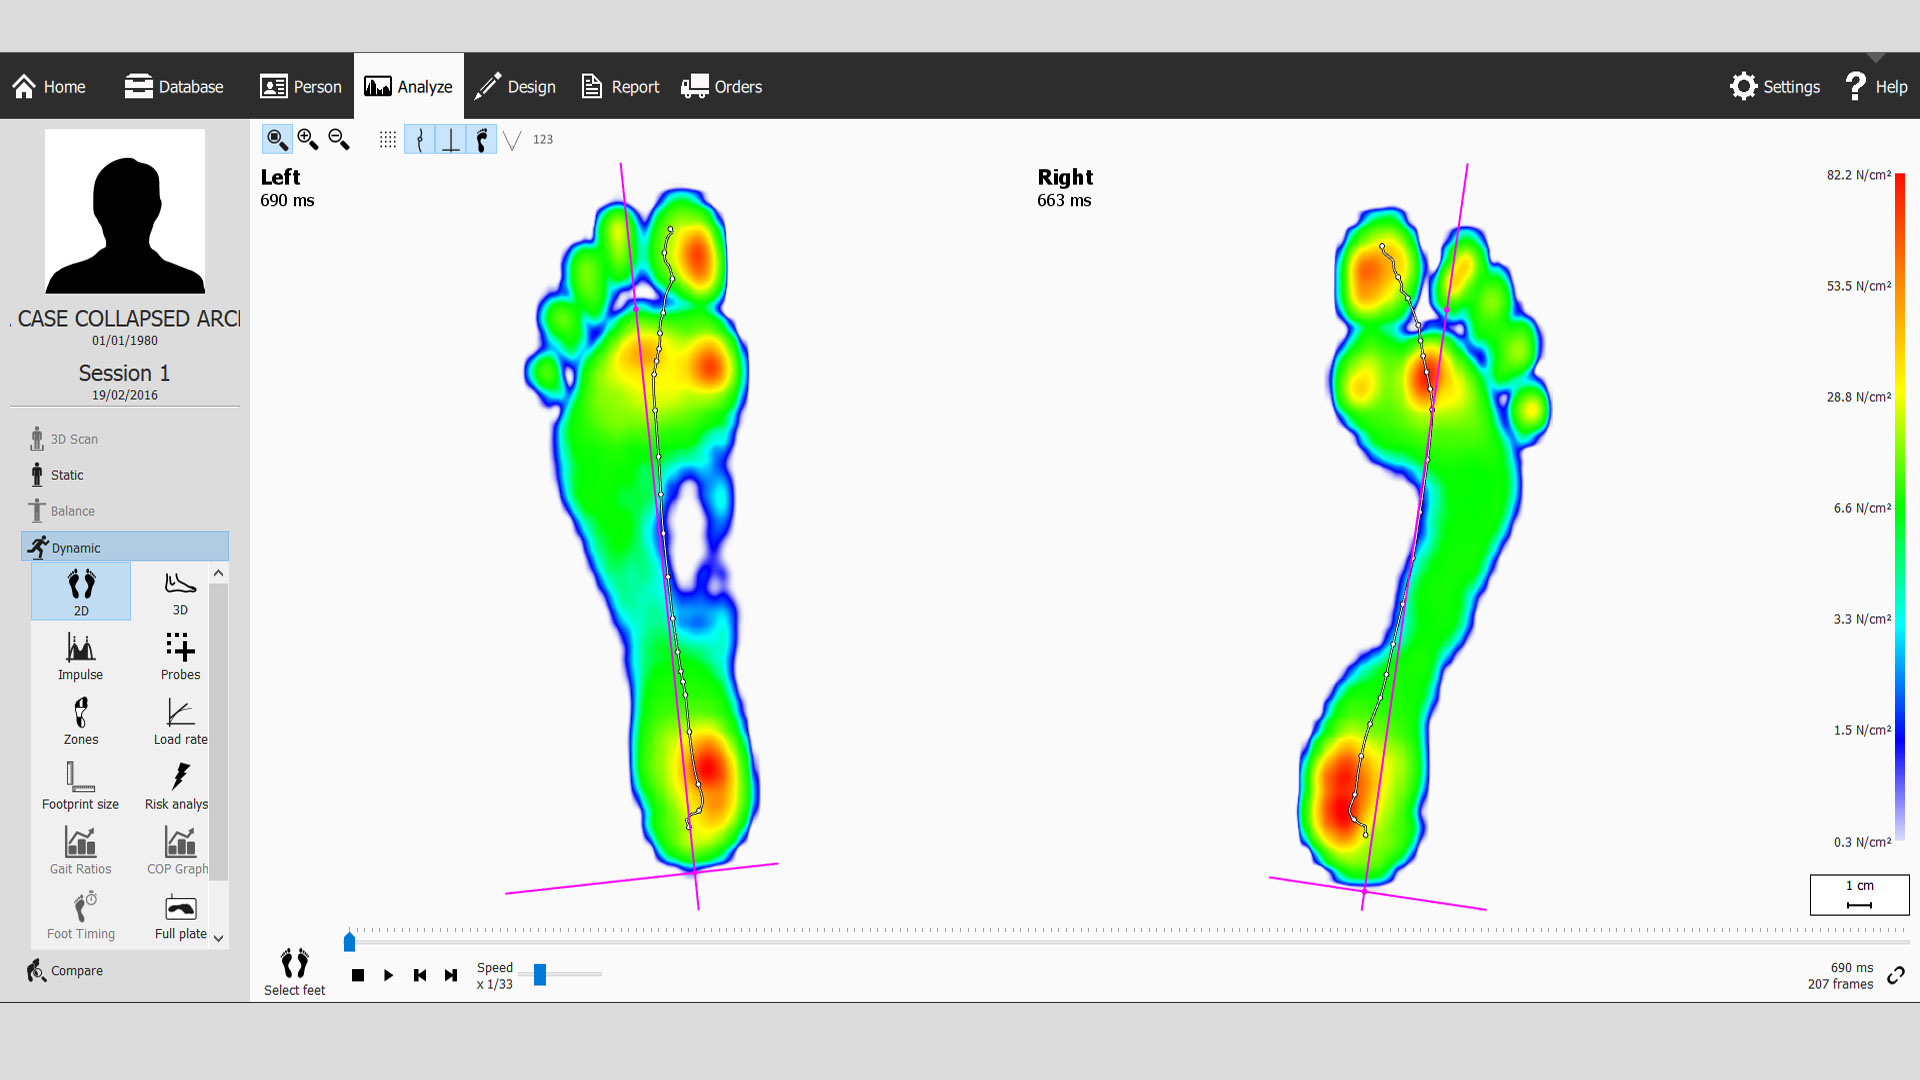 Dynamic Gait Analysis Pronated Feet